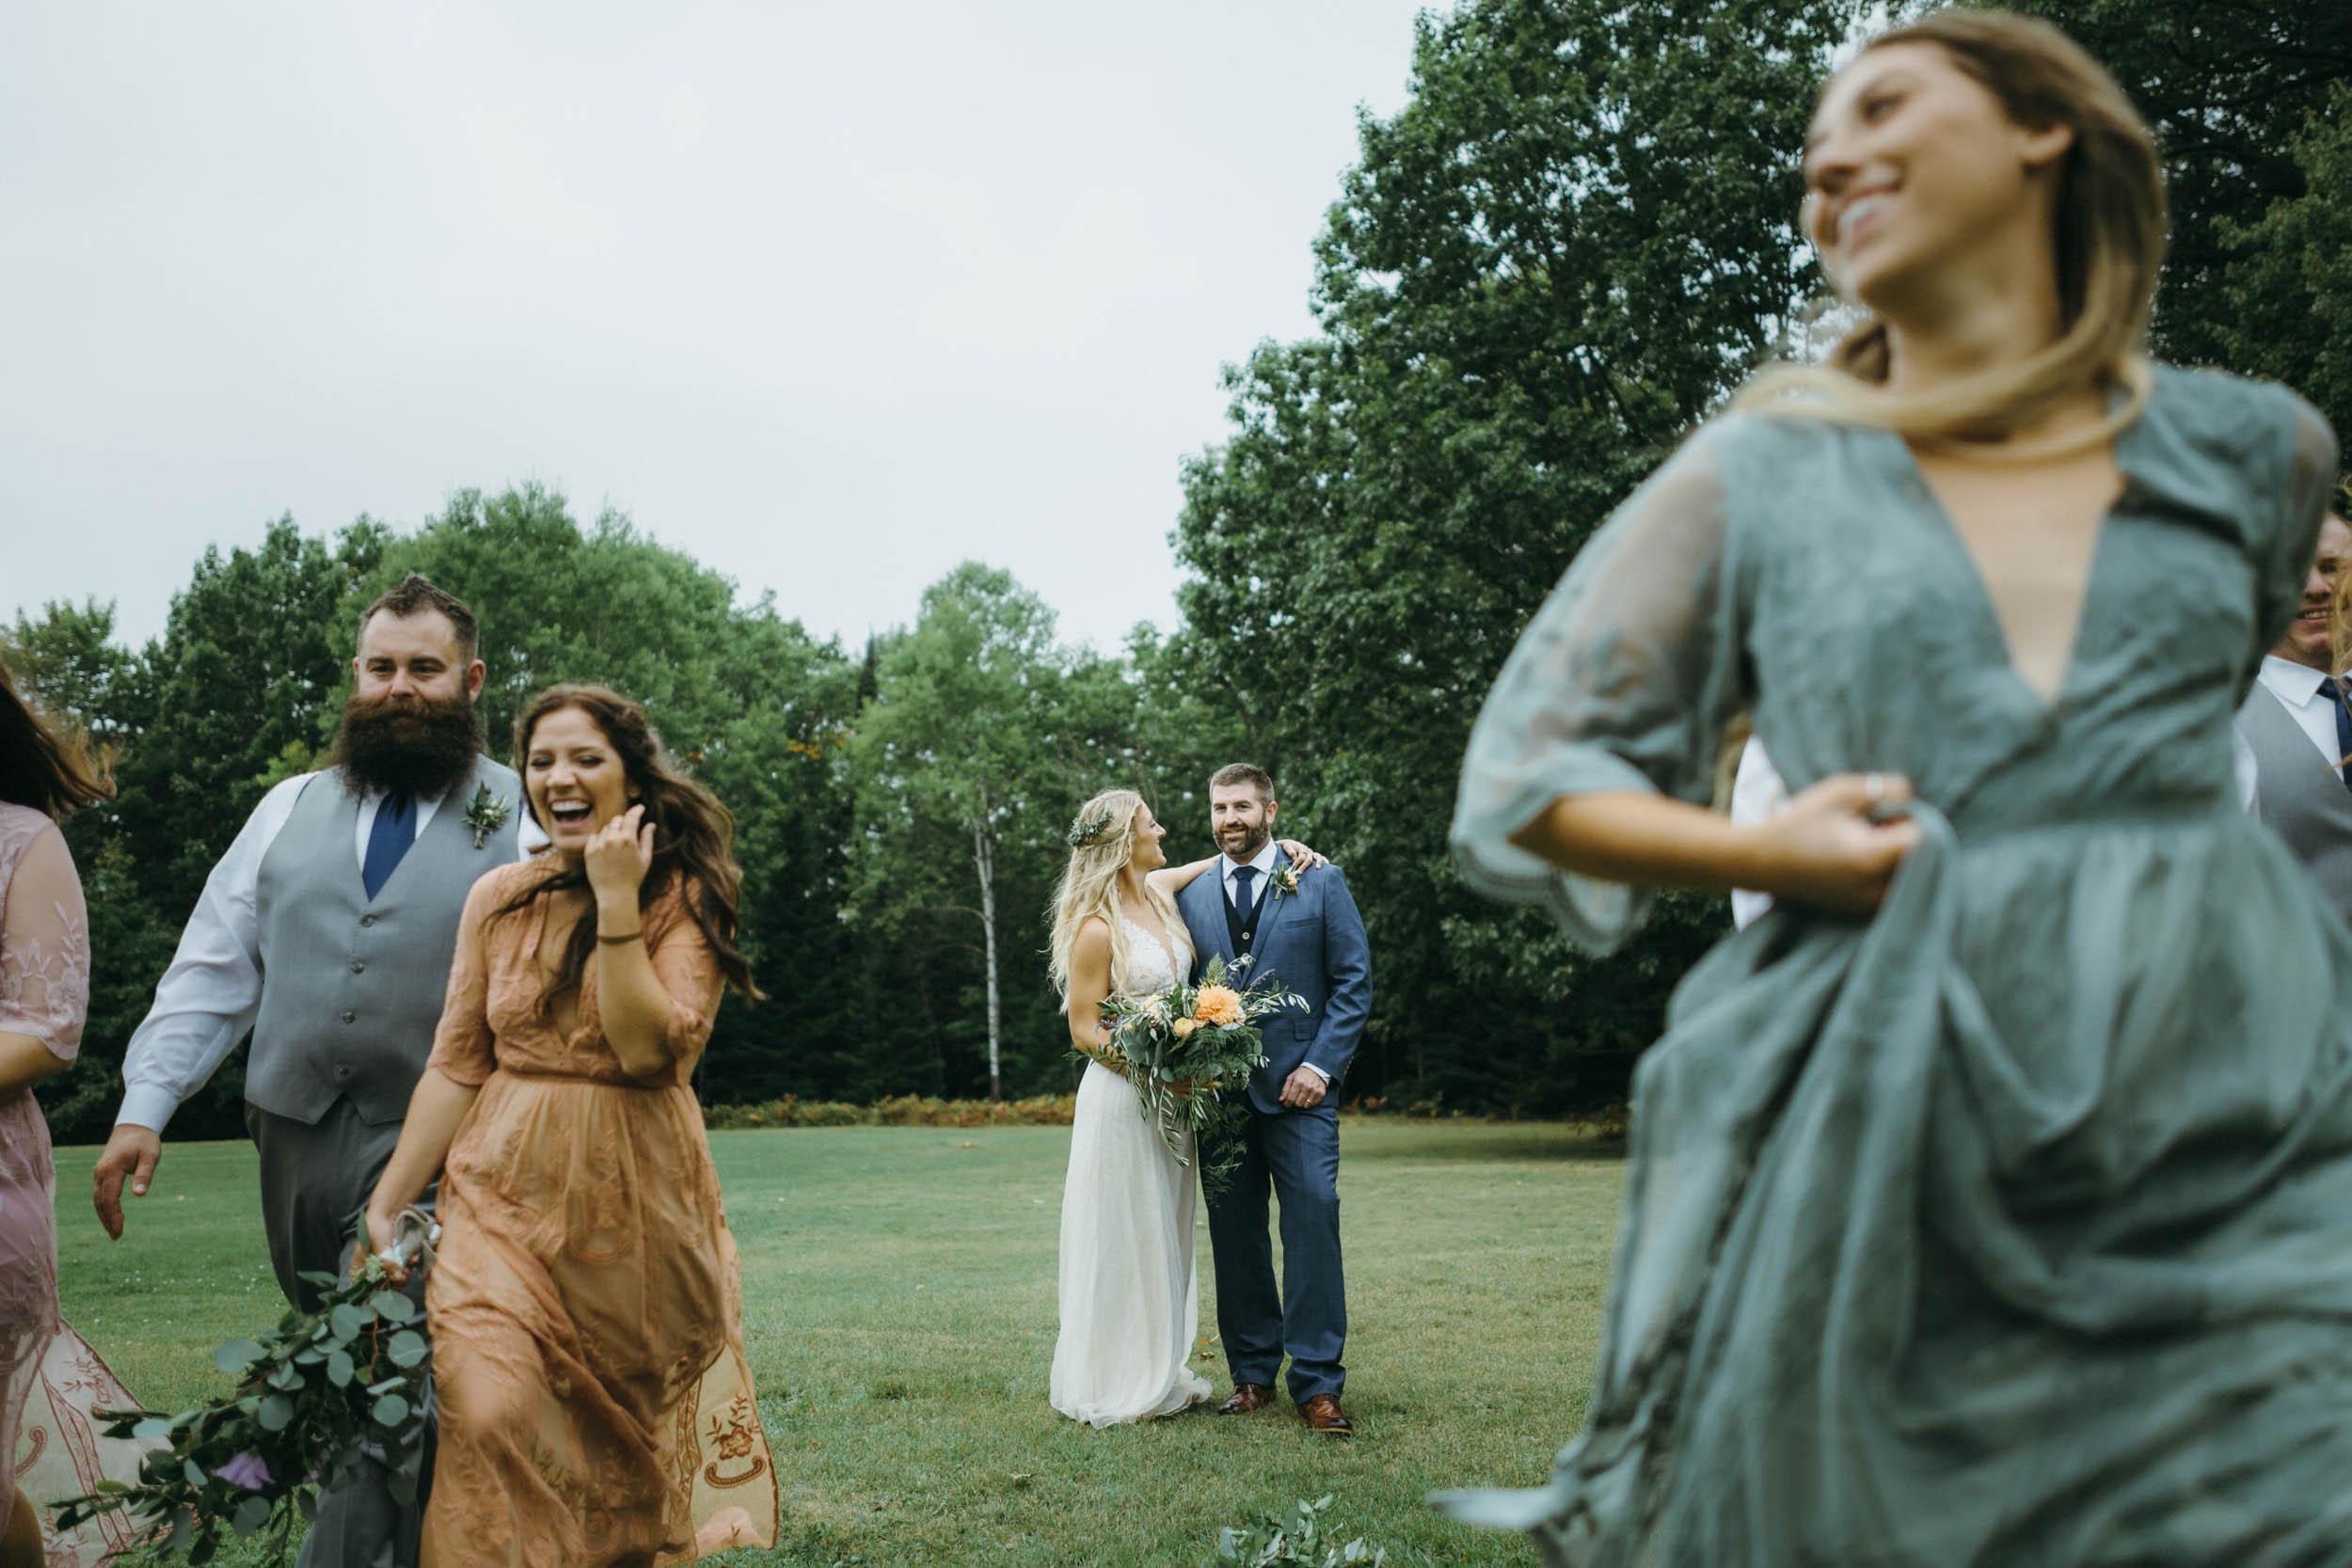 56-minneapolis boho candid outdoor backyard wedding photographer-2.jpg